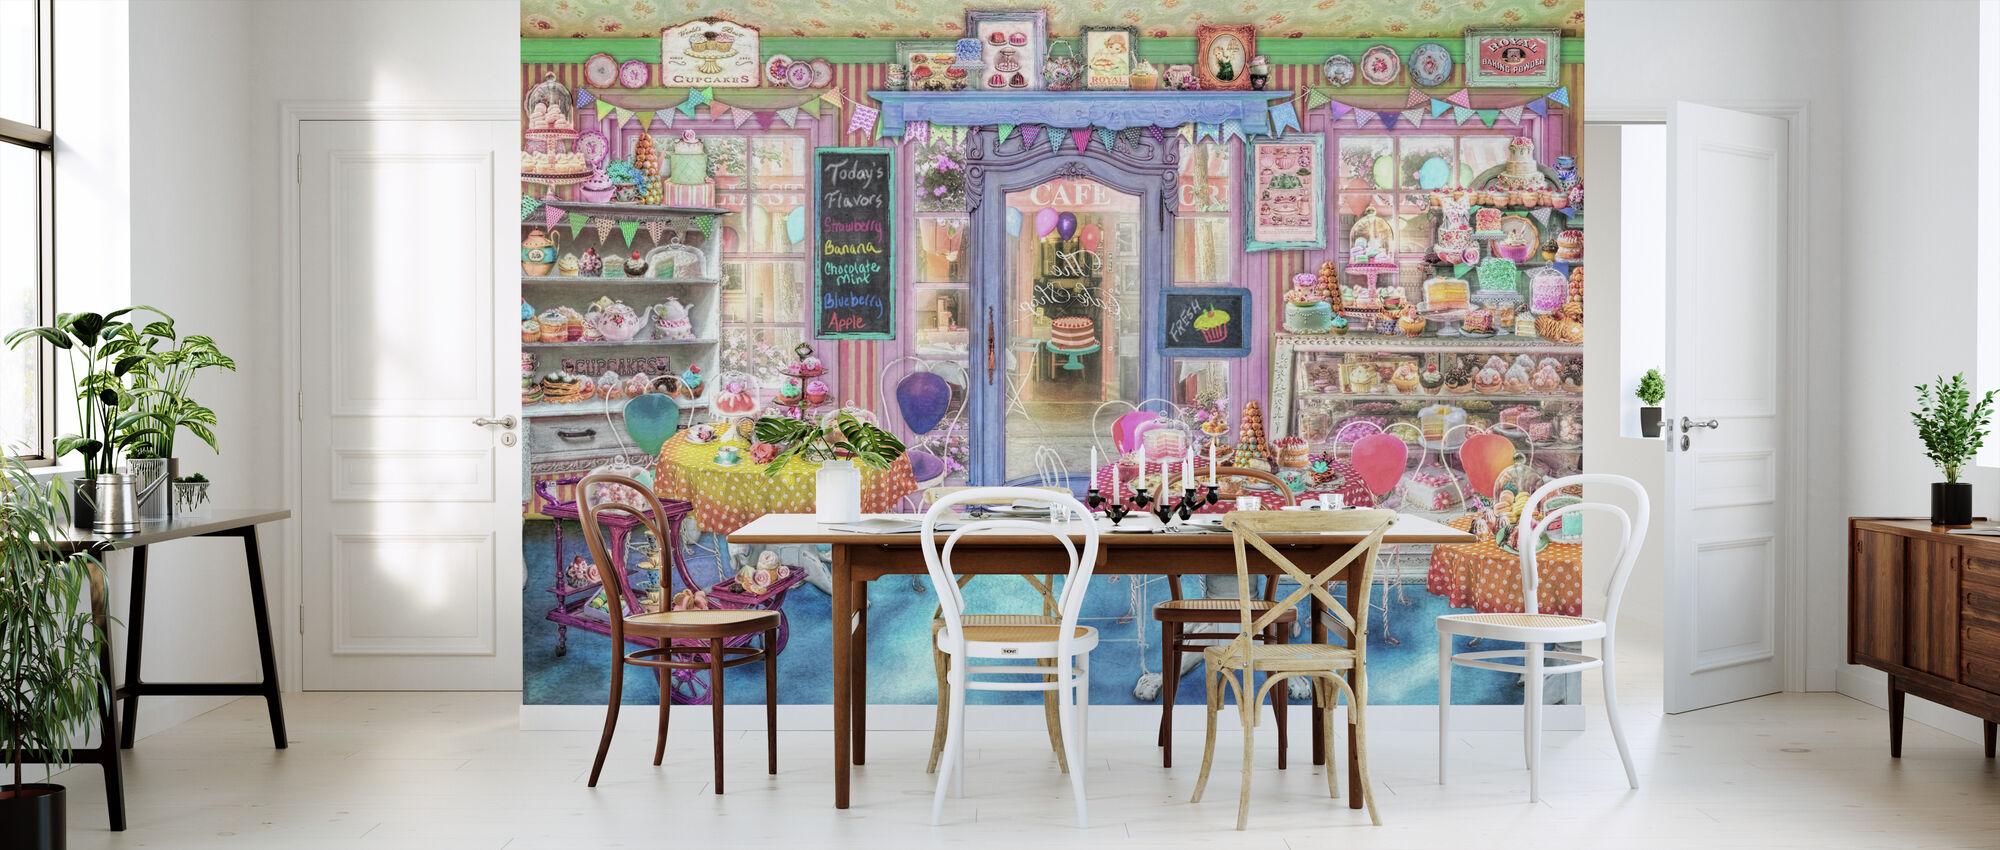 Vintage Cake Shop - Wallpaper - Kitchen